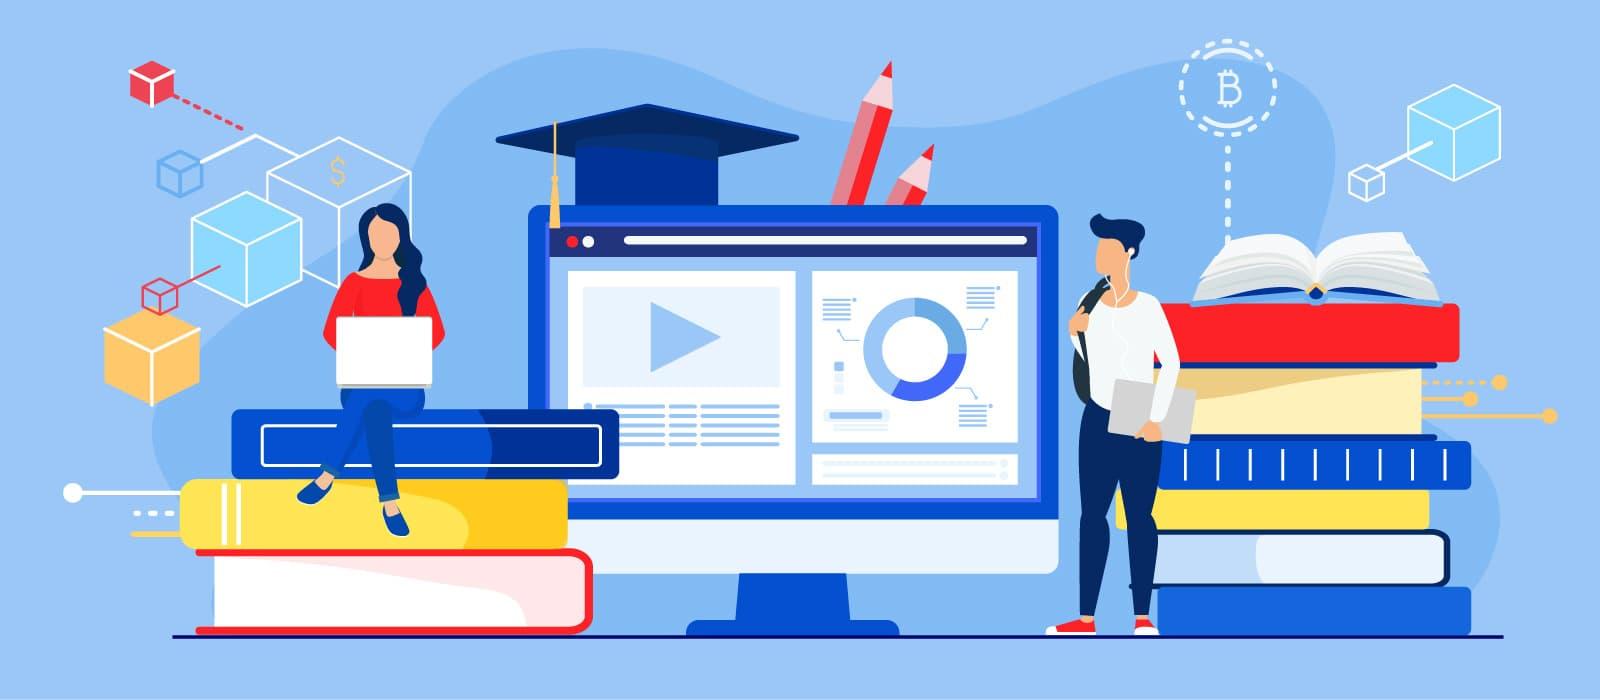 How Blockchain Can Improve Higher Education